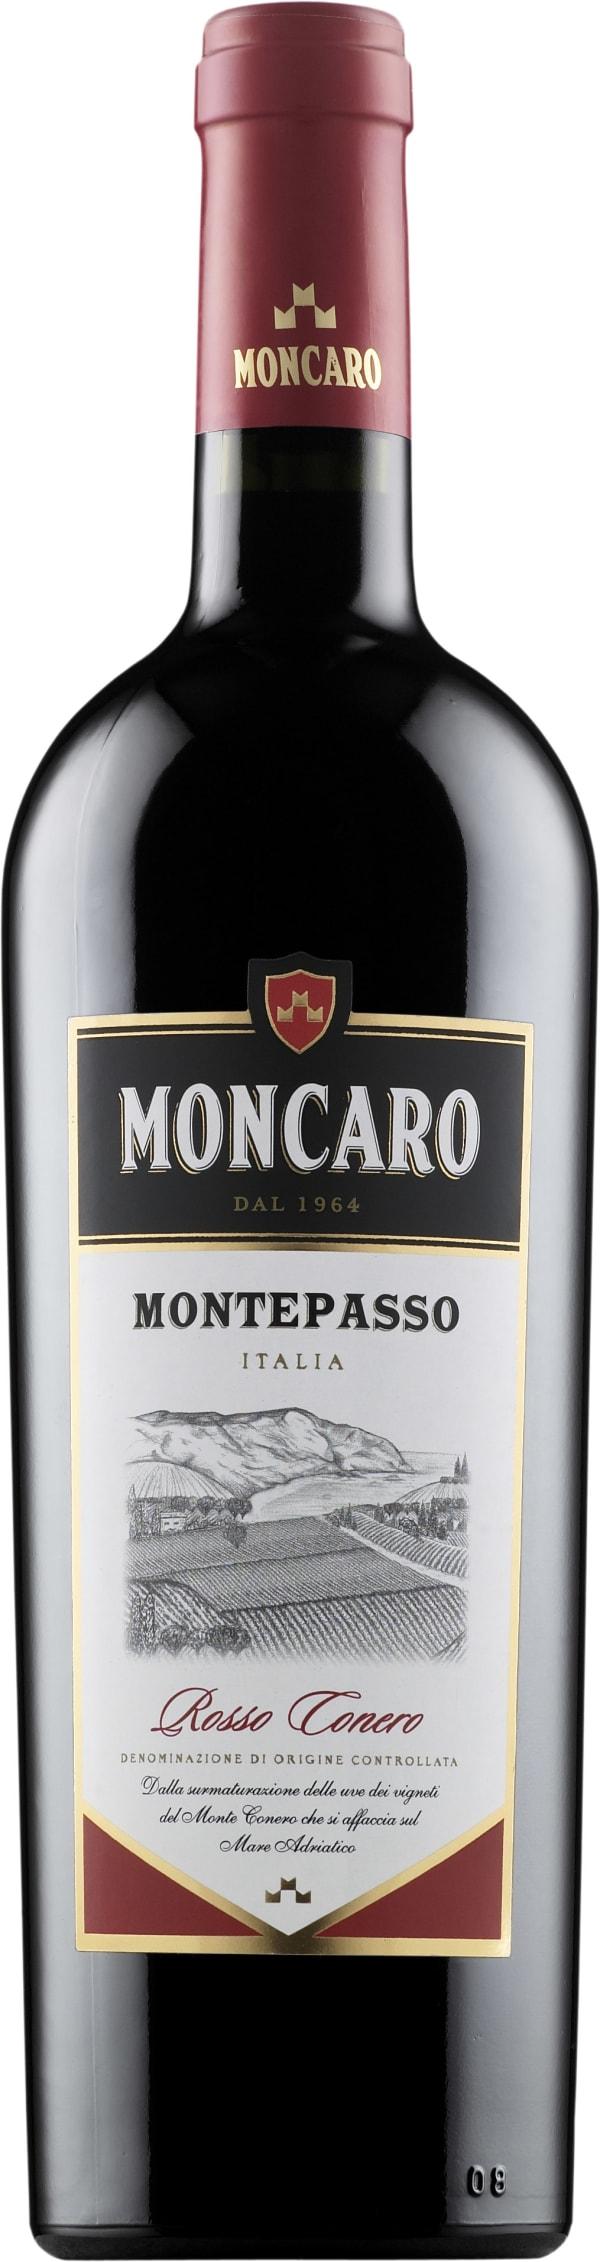 Moncaro Montepasso  2013